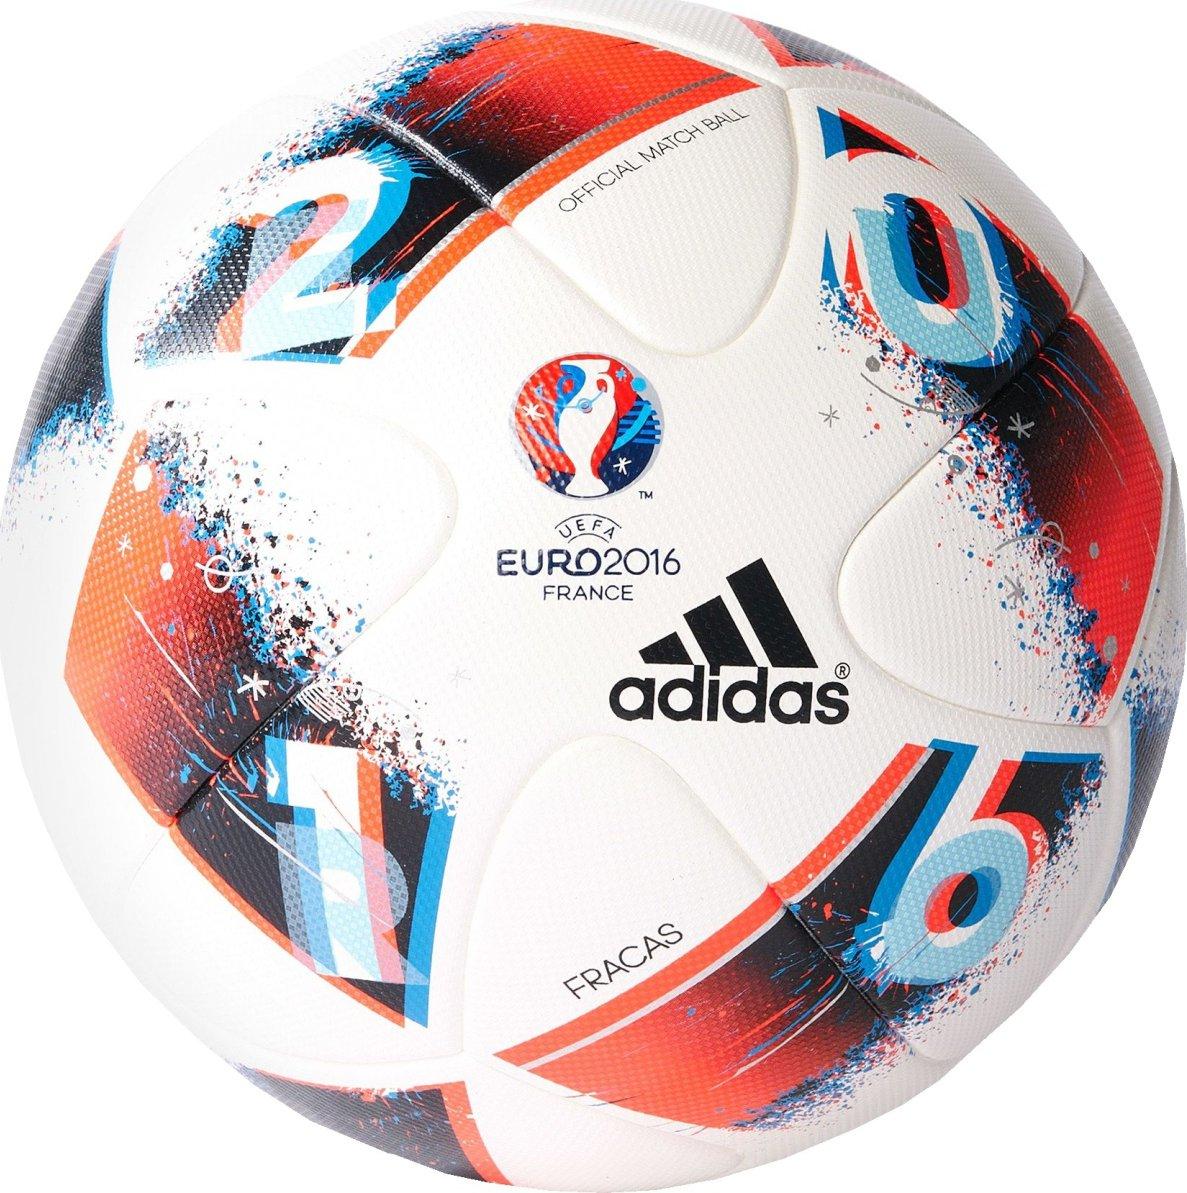 Adidas Euro16 Omb od 2 480 Kč • Zboží.cz b135c067f9